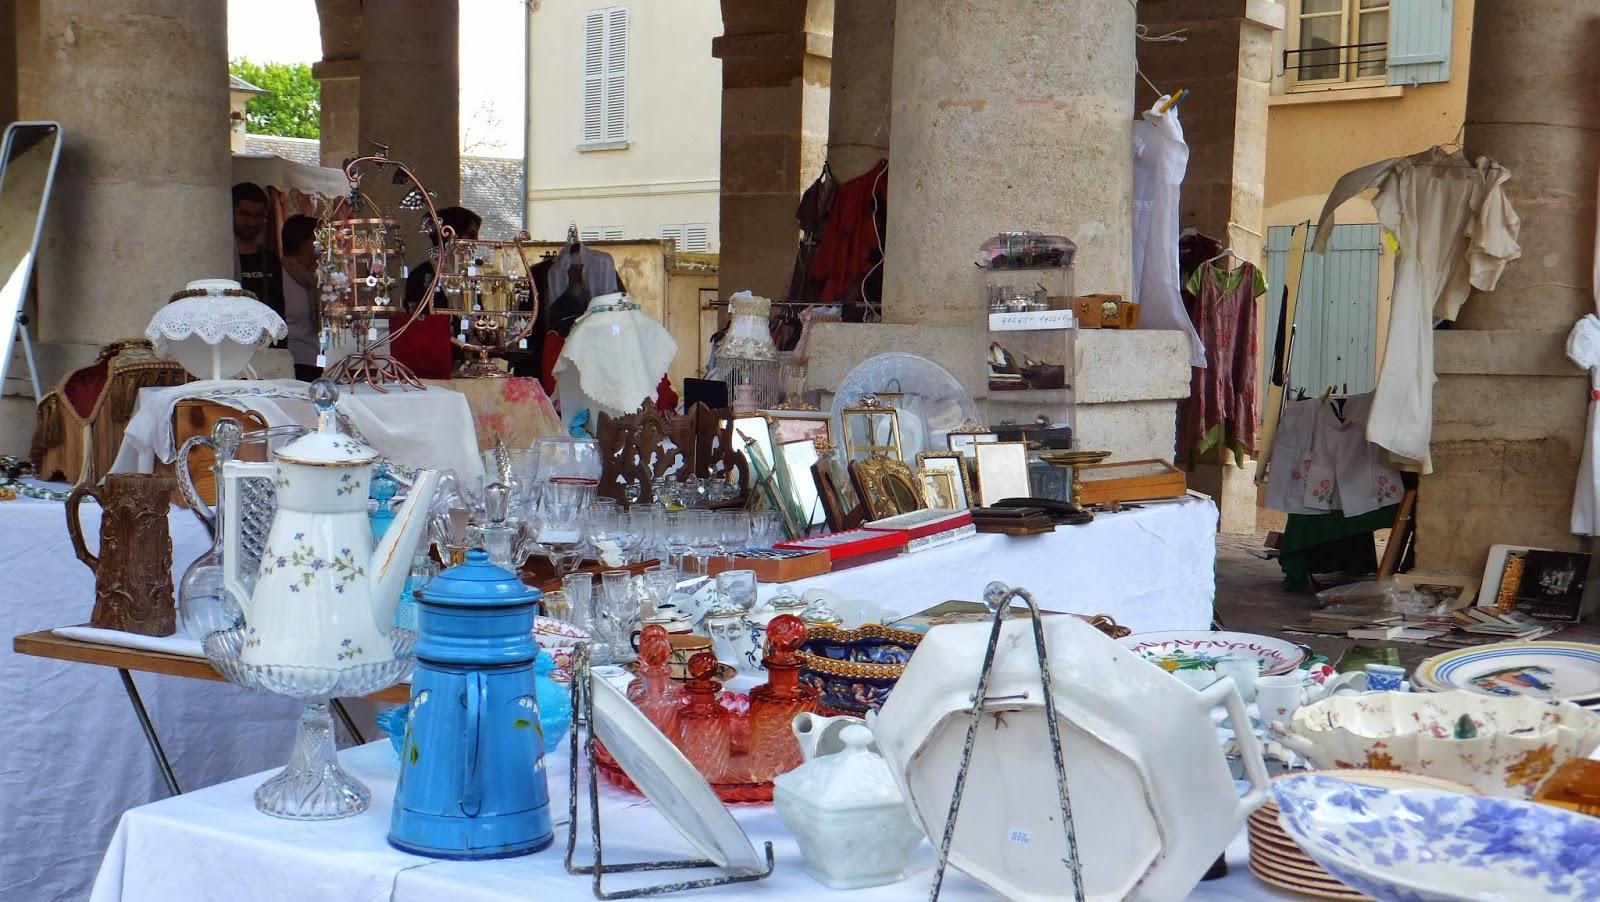 La Roche-Guyon, Francia, Elisa N, Blog de Viajes Argentina, Lifestyle